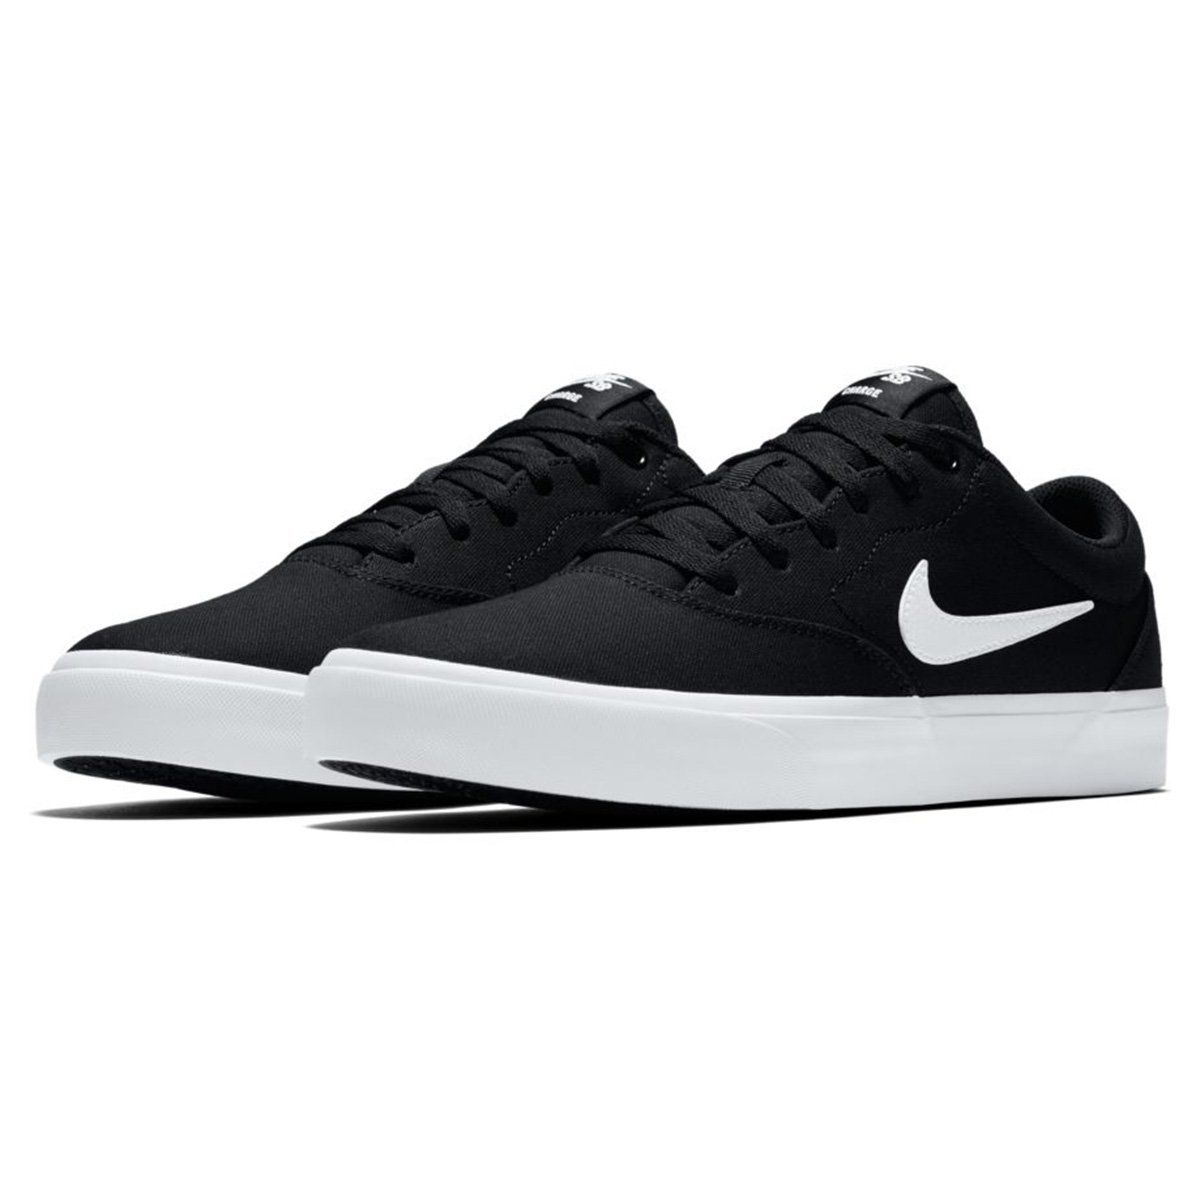 Tenis Masculino Nike Sb Charge Skate e Casual